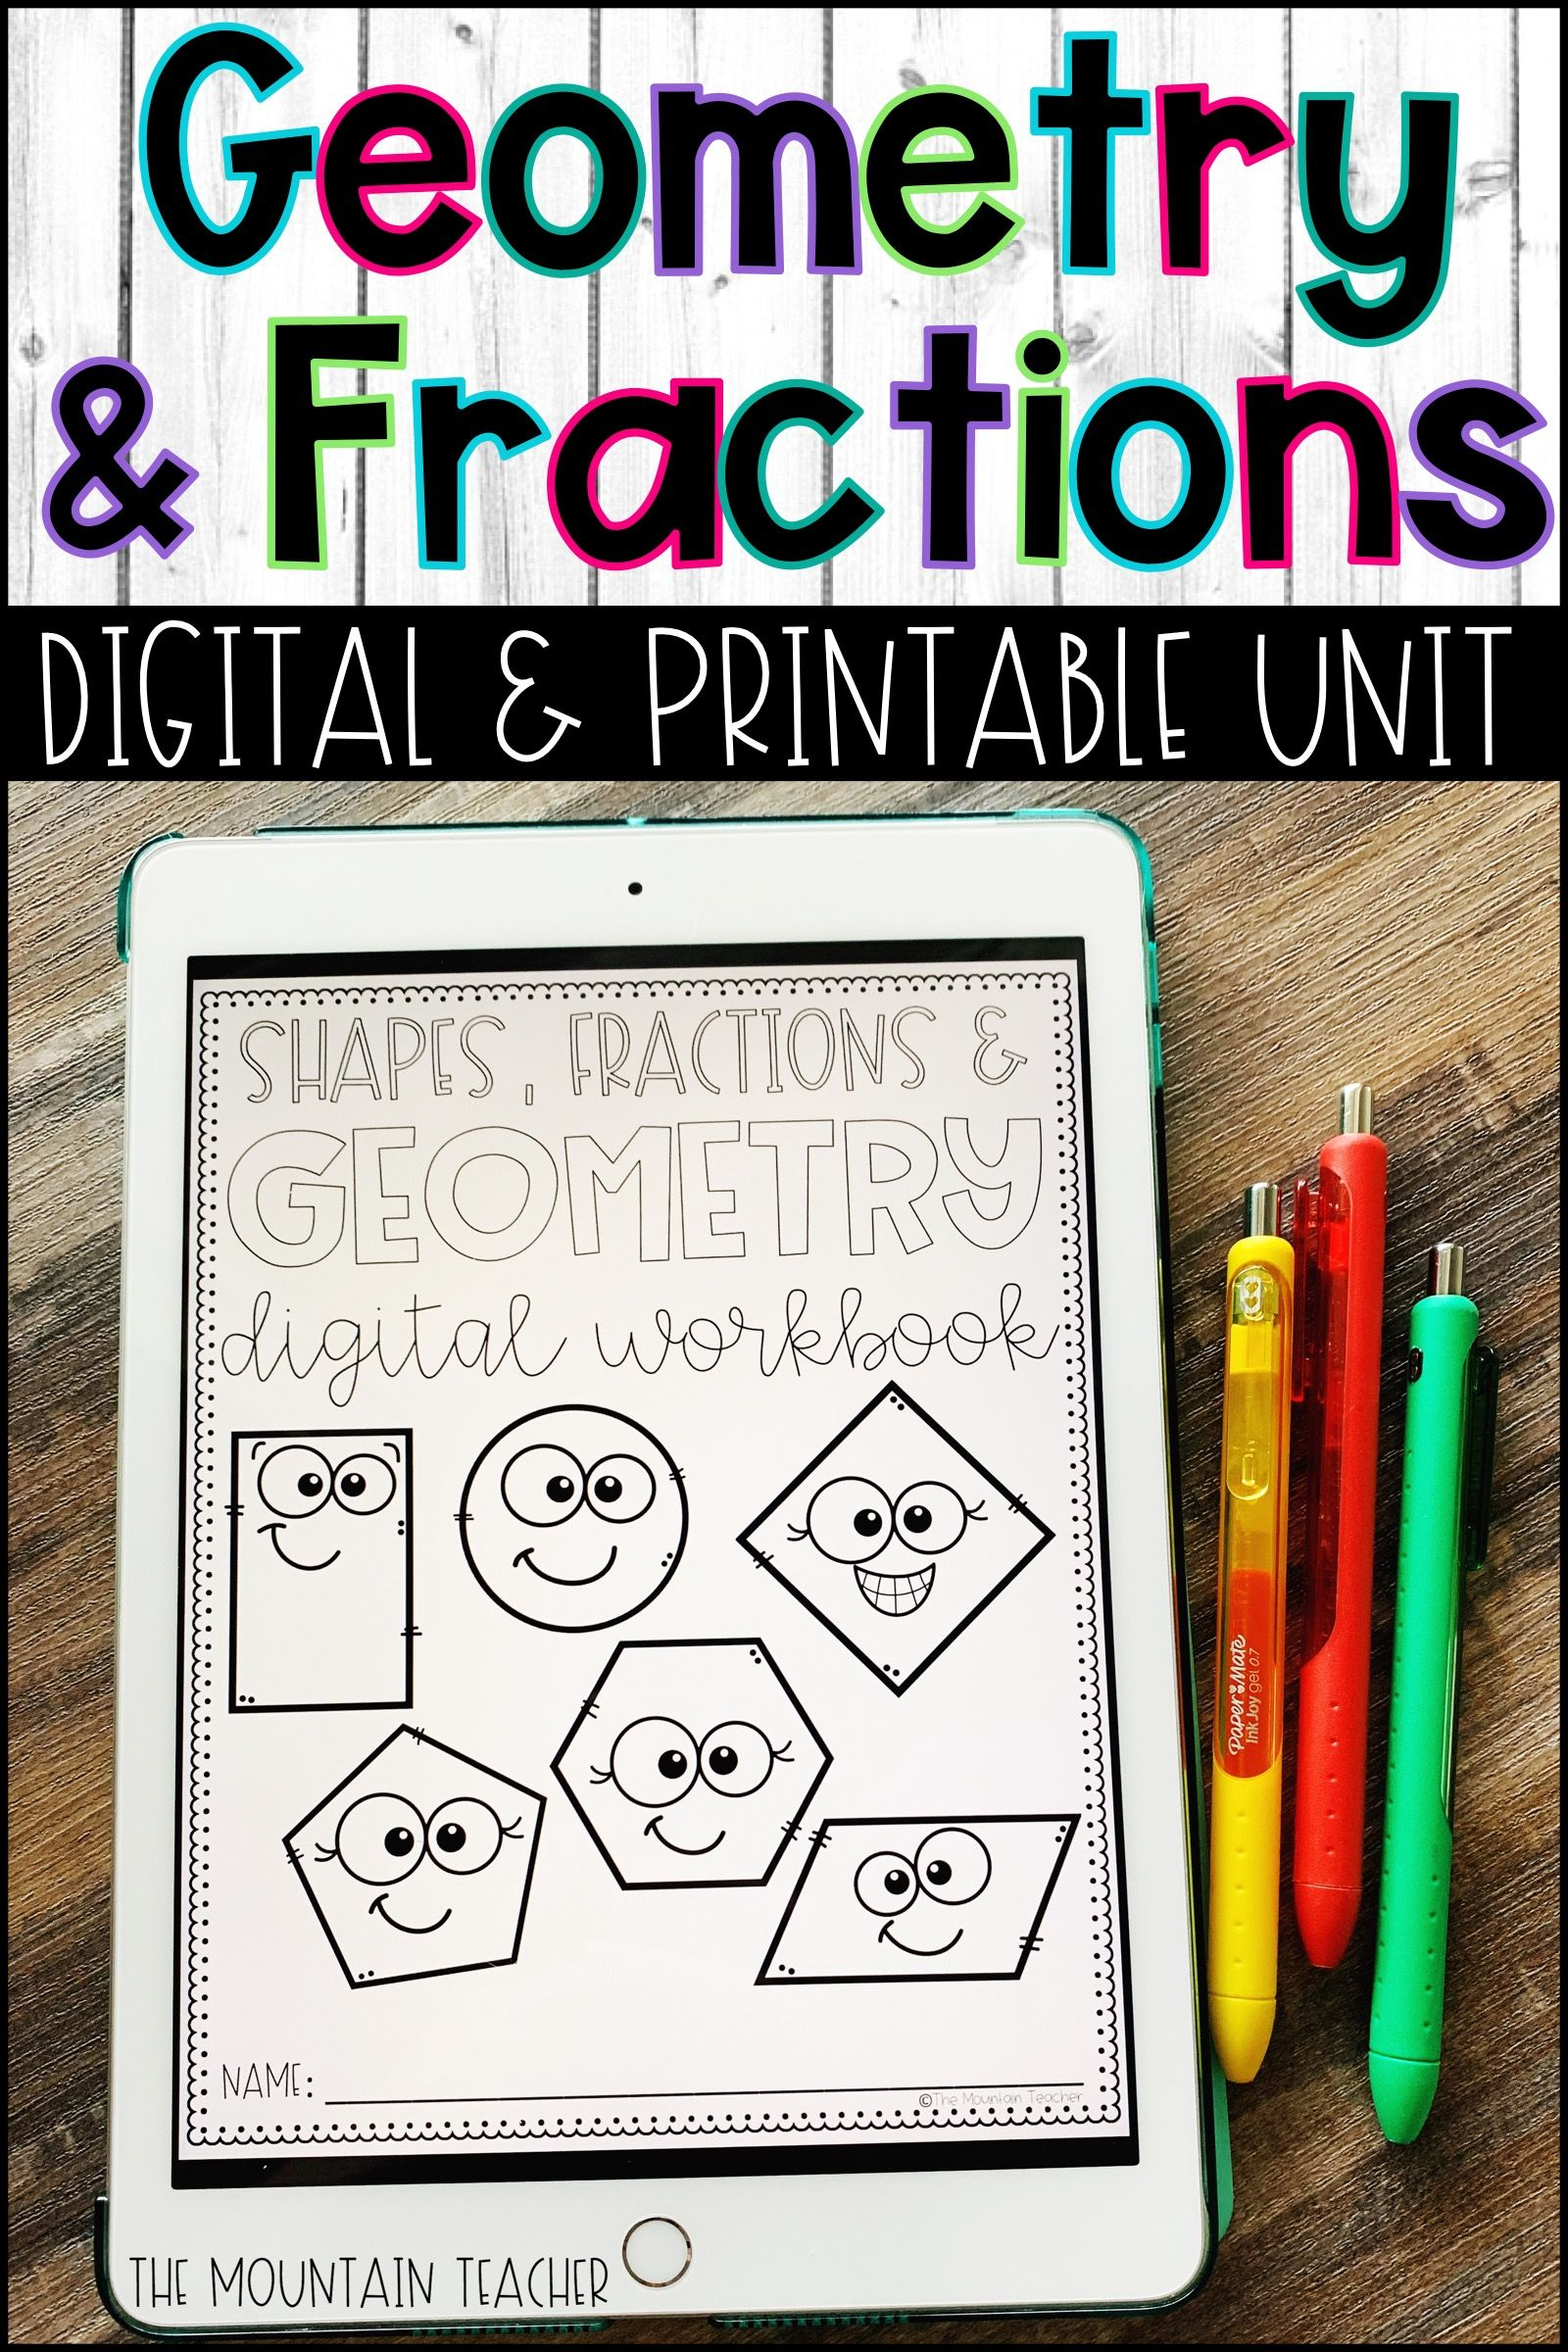 Digital 2nd Grade Geometry Unit For Google Classroom On Google Slides Geometry Worksheets Elementary Math Lessons Teaching Geometry